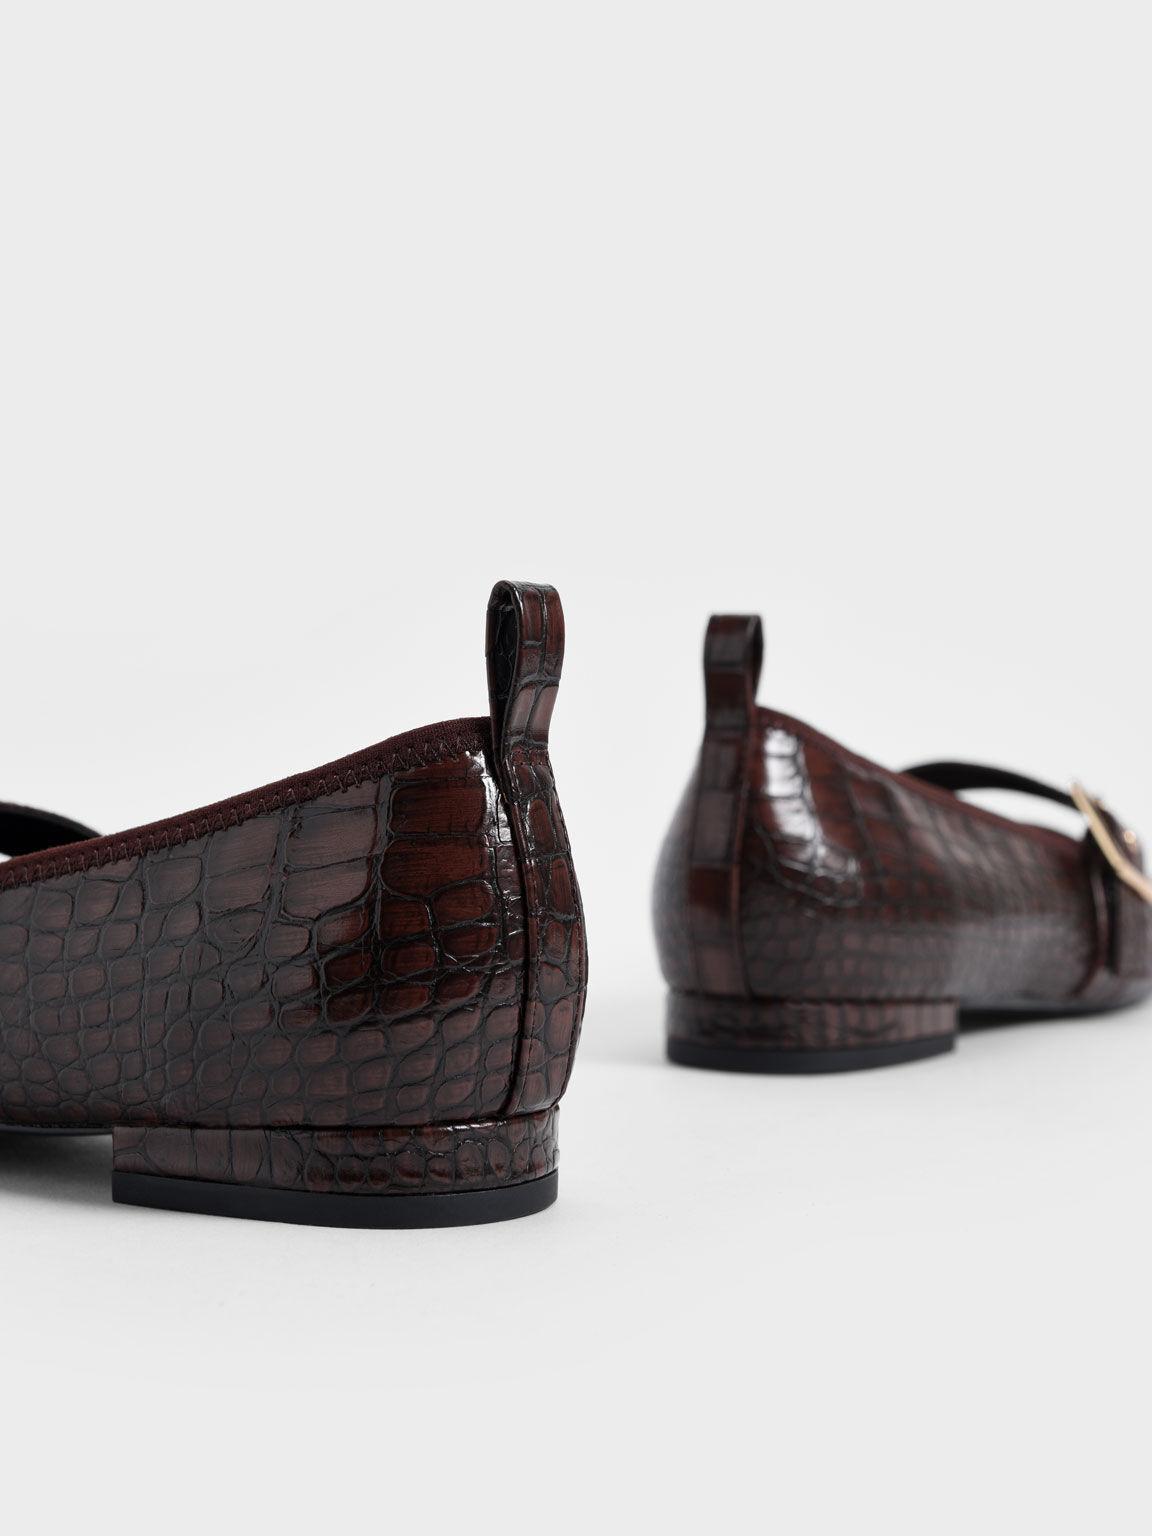 Croc-Effect Square Toe Mary Jane Flats, Animal Print Brown, hi-res